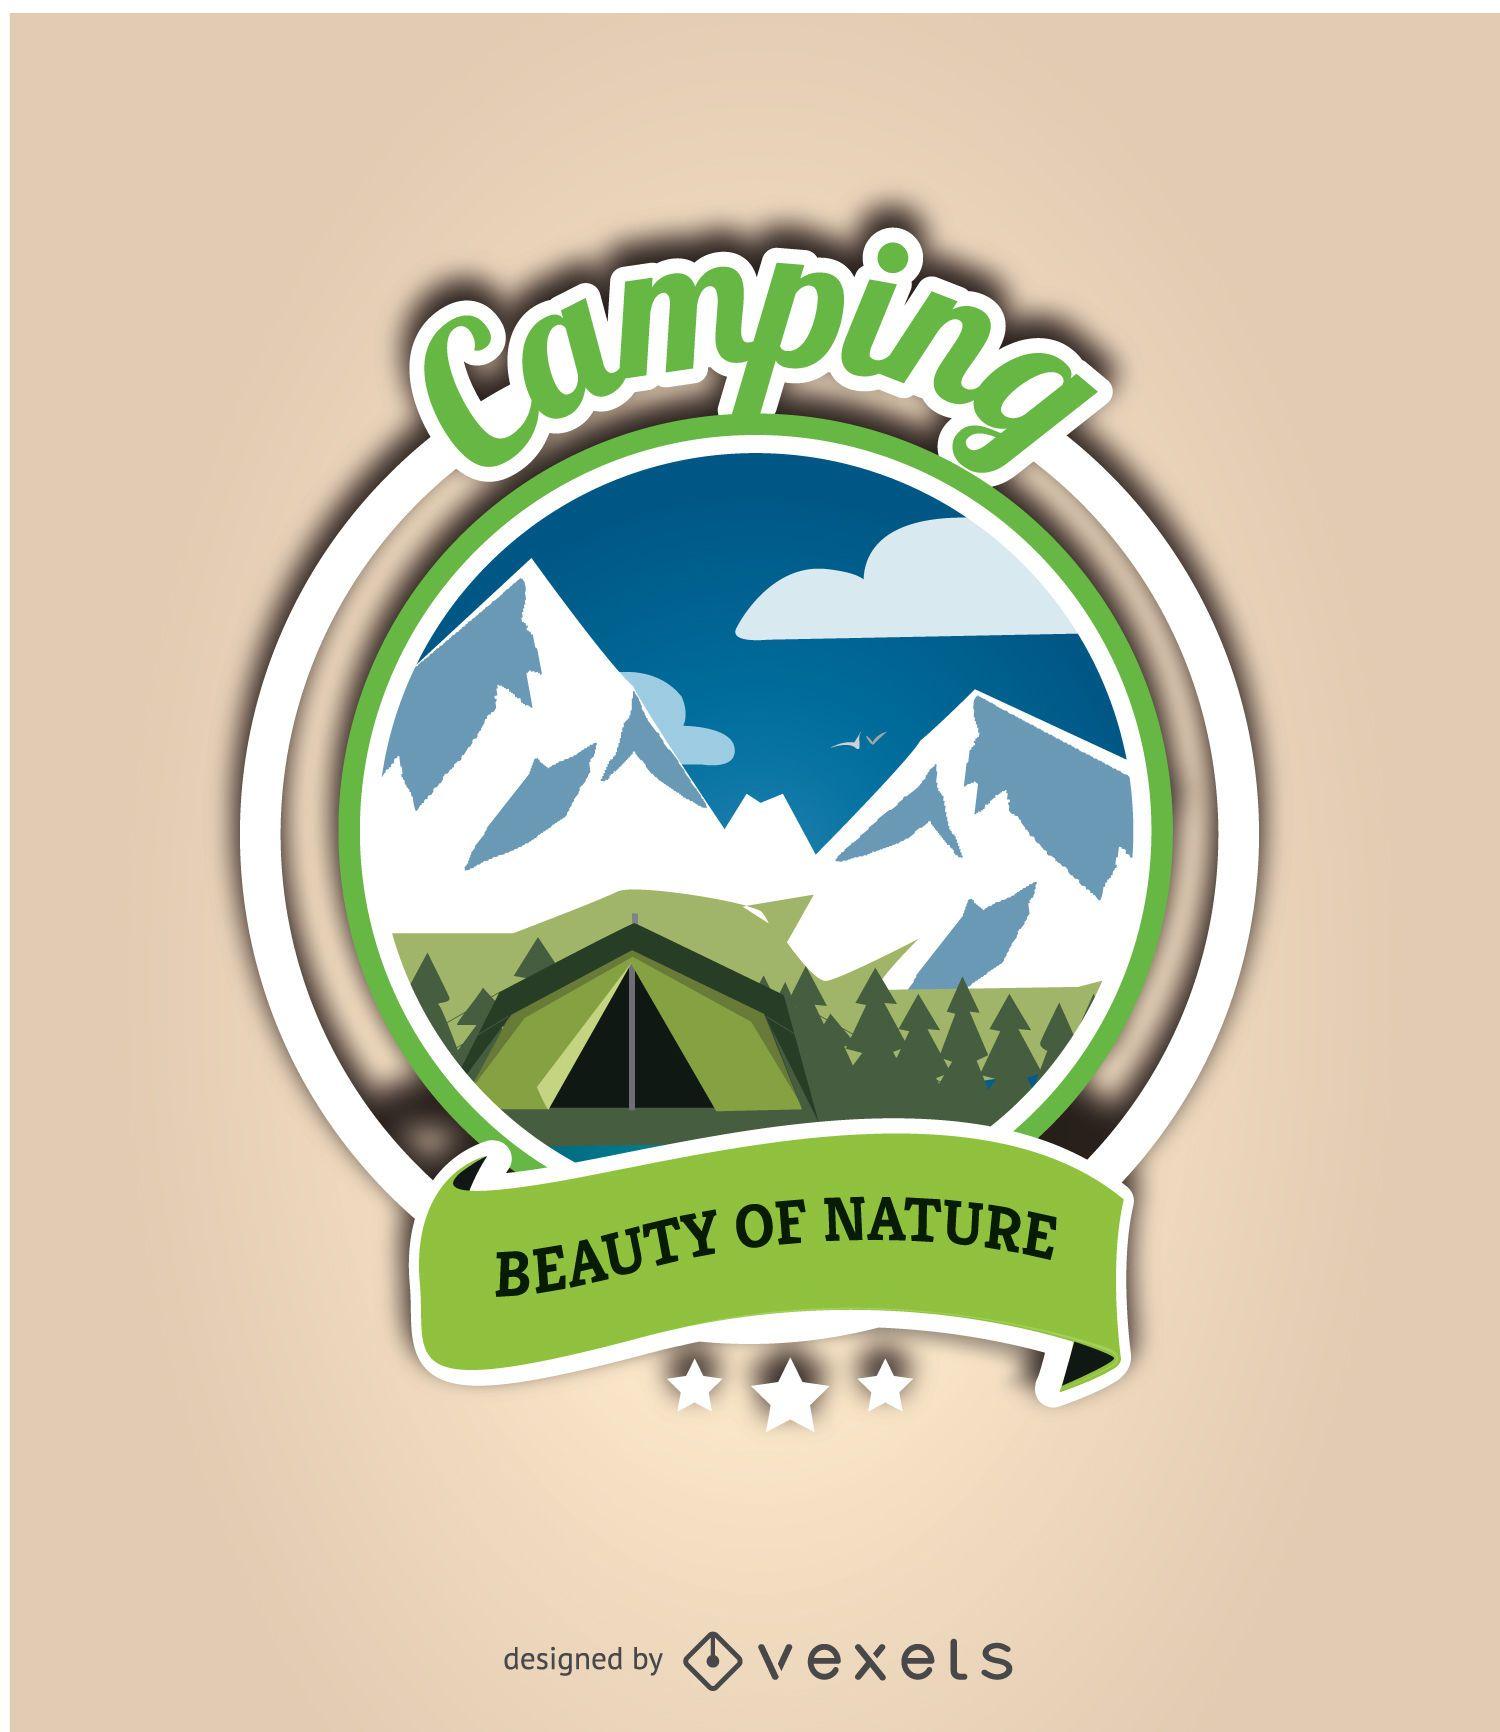 Camping label